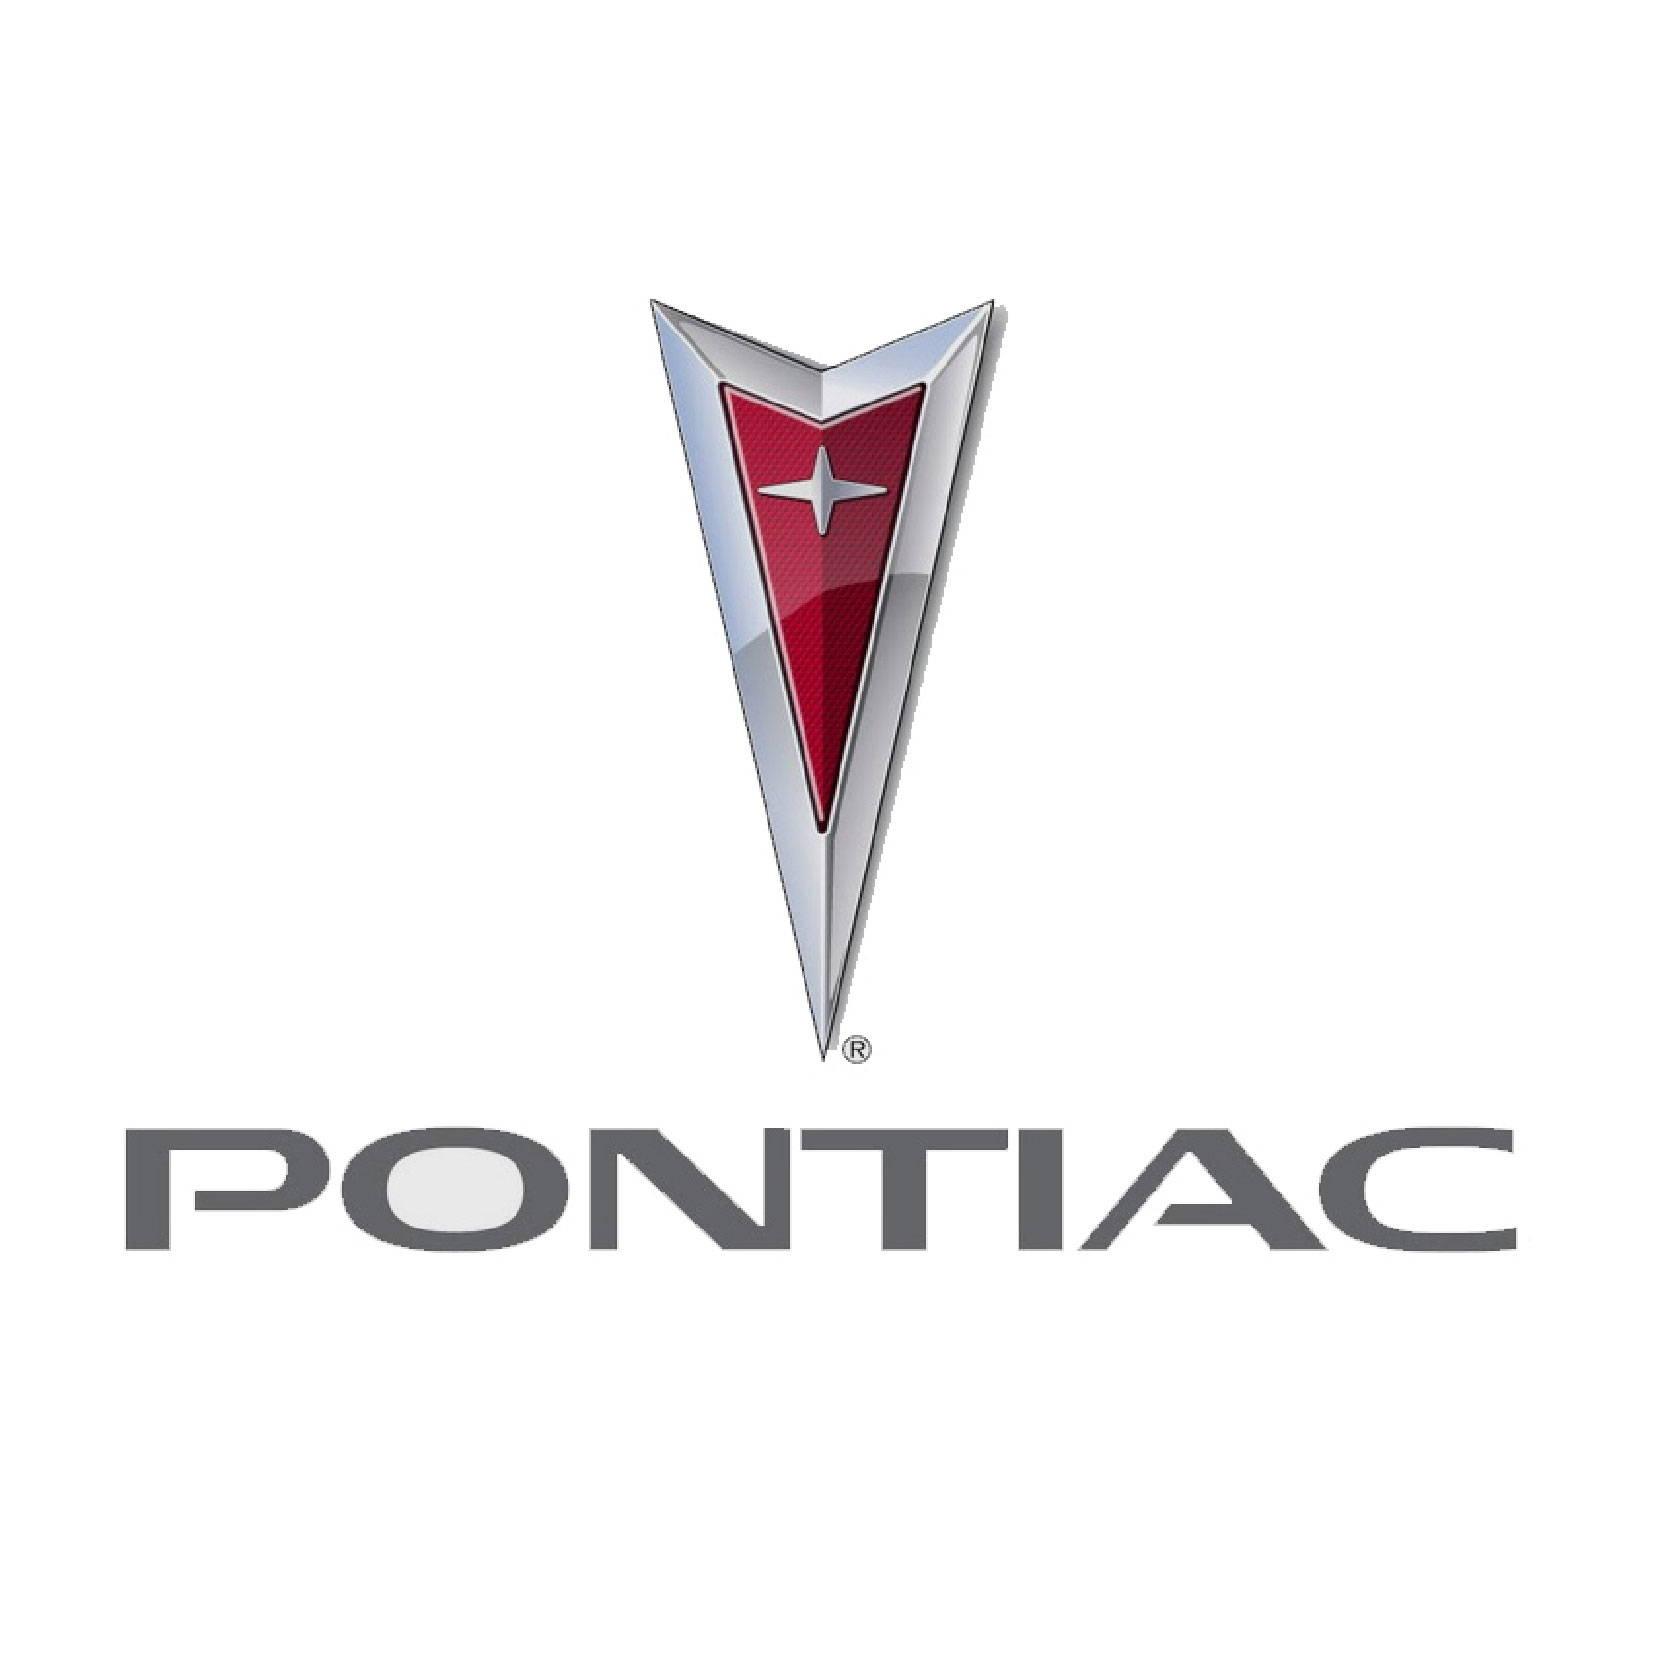 Pontiac sound deadening